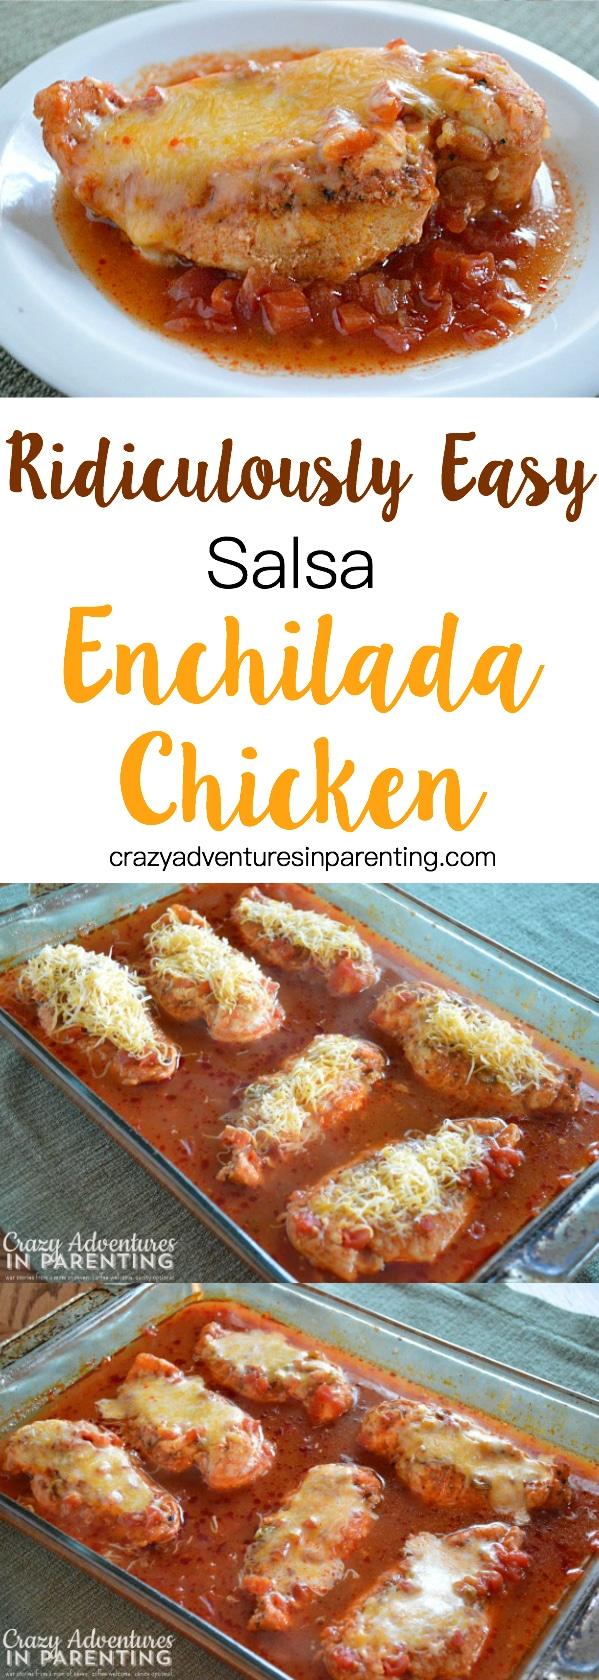 Ridiculously Easy Salsa Enchilada Chicken